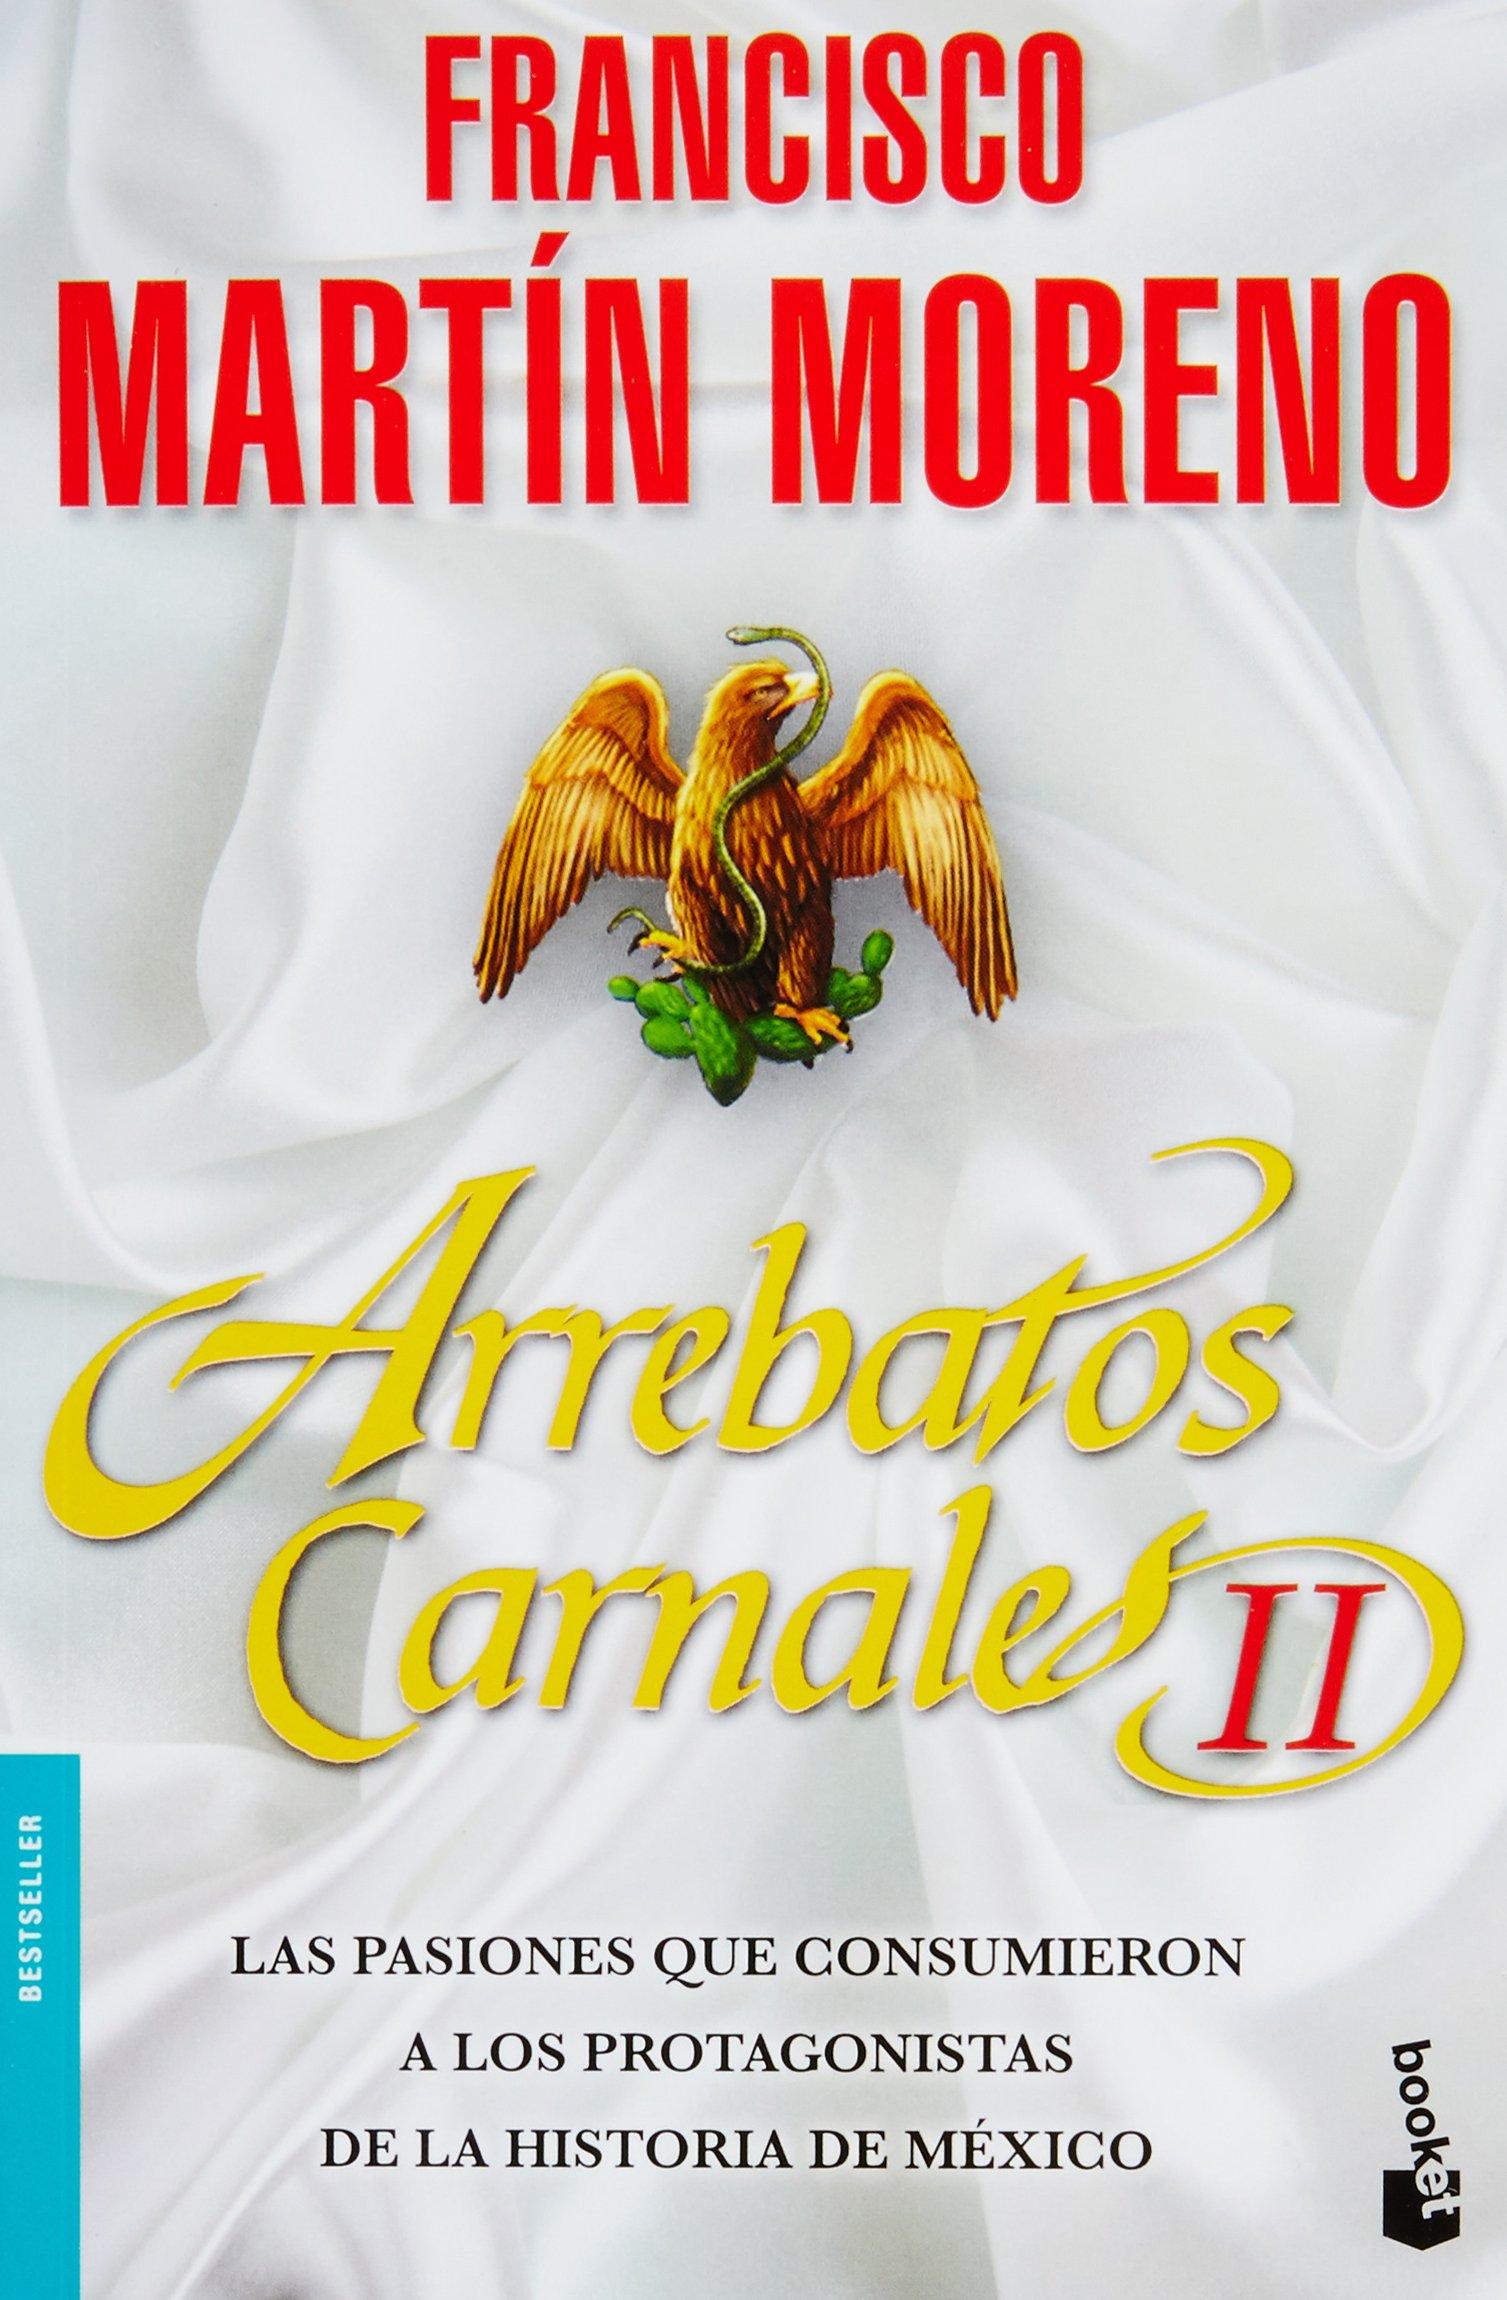 Arrebatos carnales 2 (Spanish Edition) (Spanish) Paperback – December 20,  2018